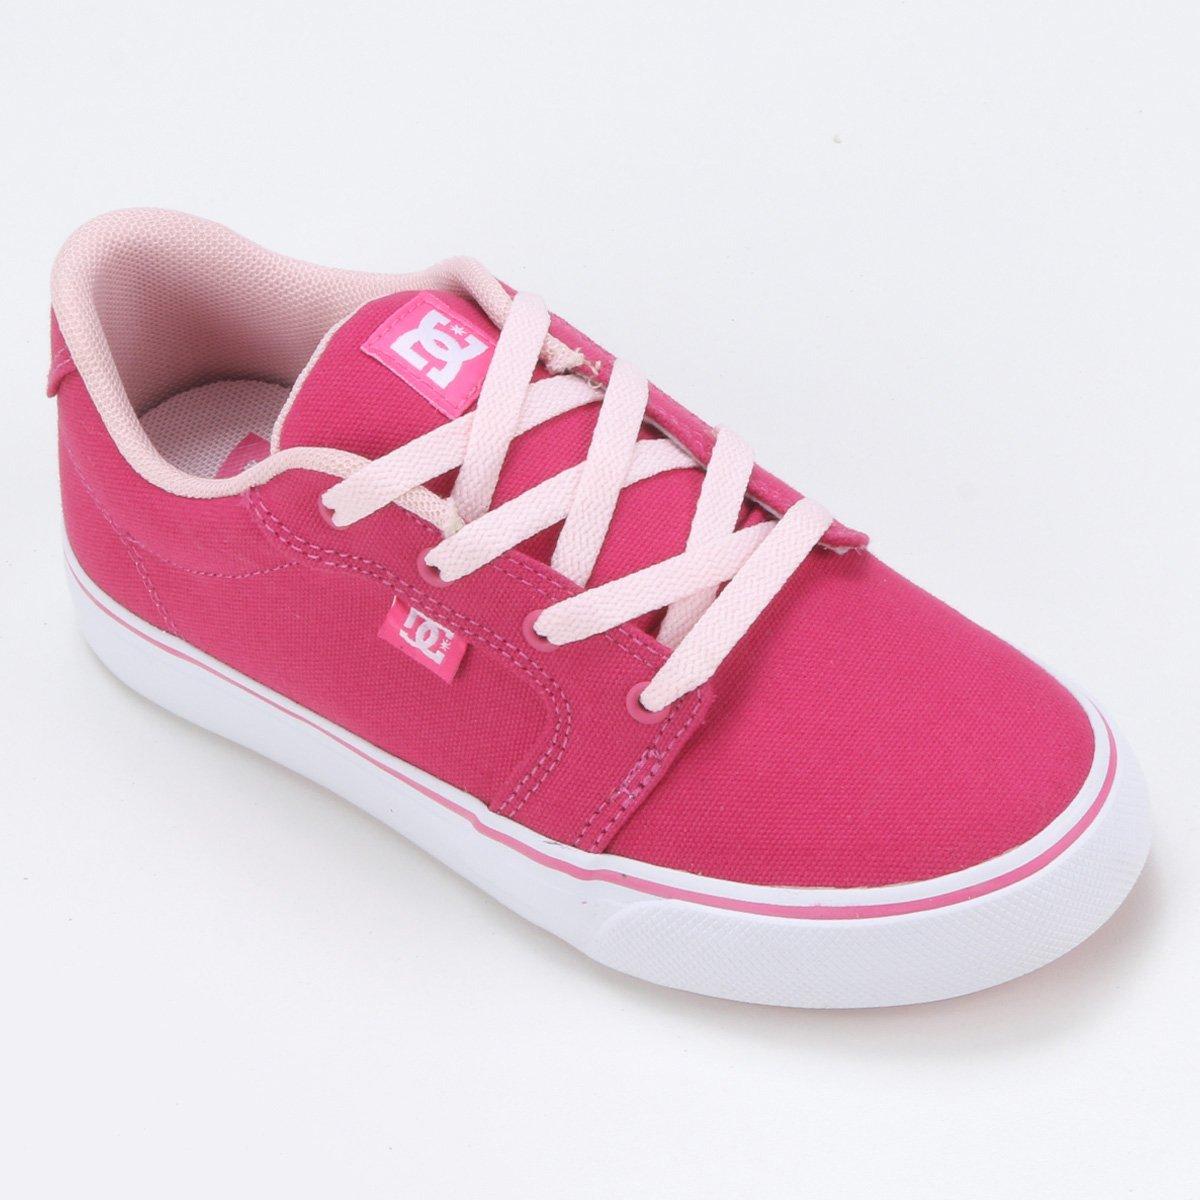 574438995b Tênis Infantil DC Shoes Anvil Tx La 1 Feminino - Pink - Compre Agora ...